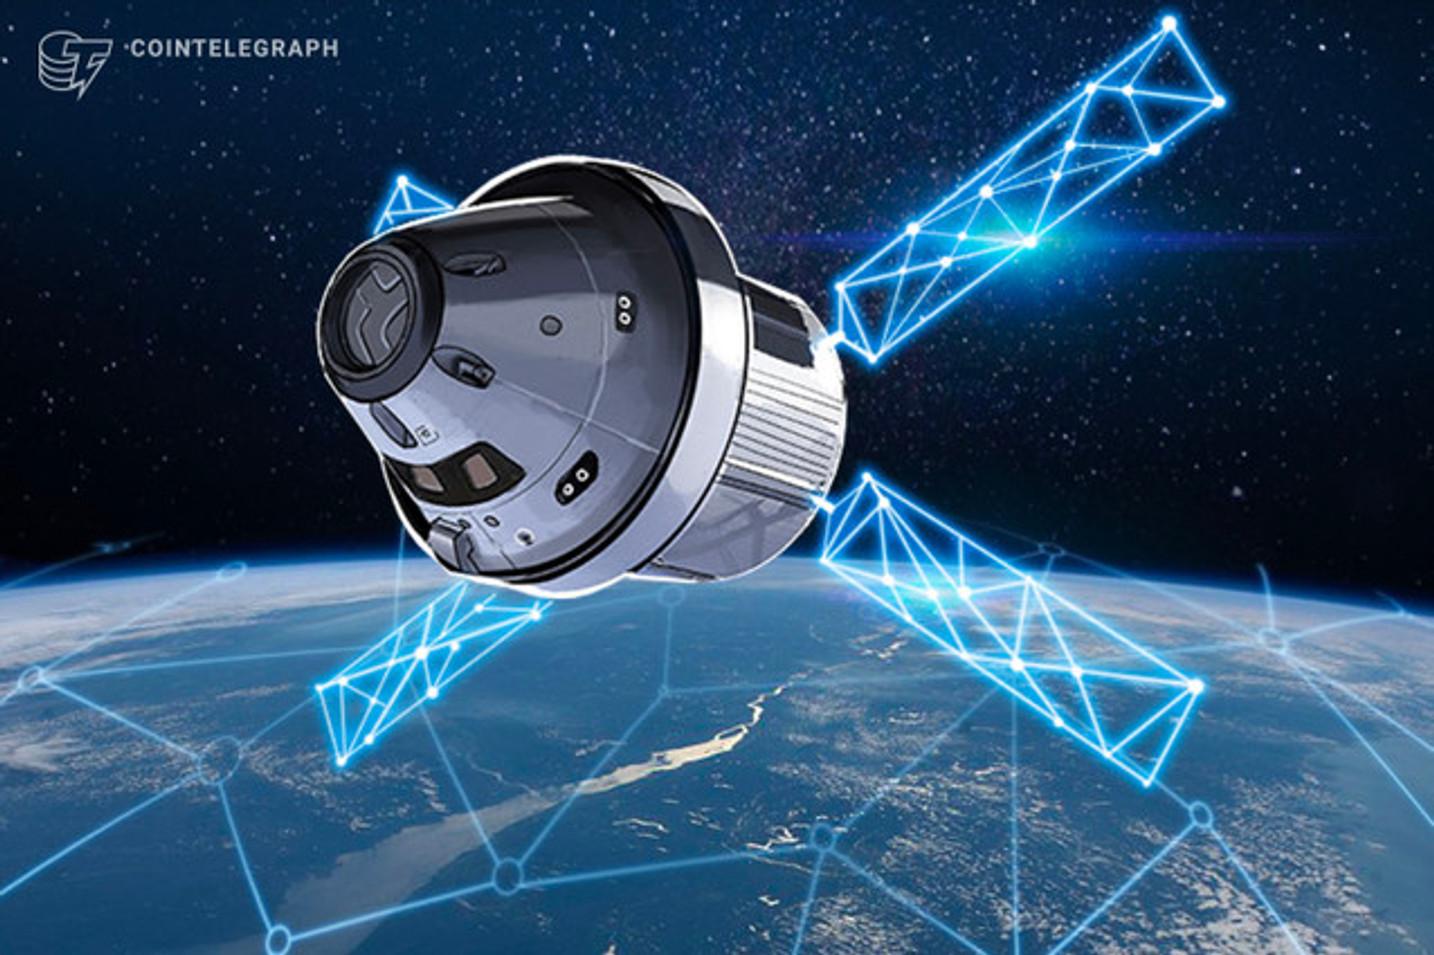 JPMorgan testa i pagamenti blockchain tra satelliti nell'orbita terrestre